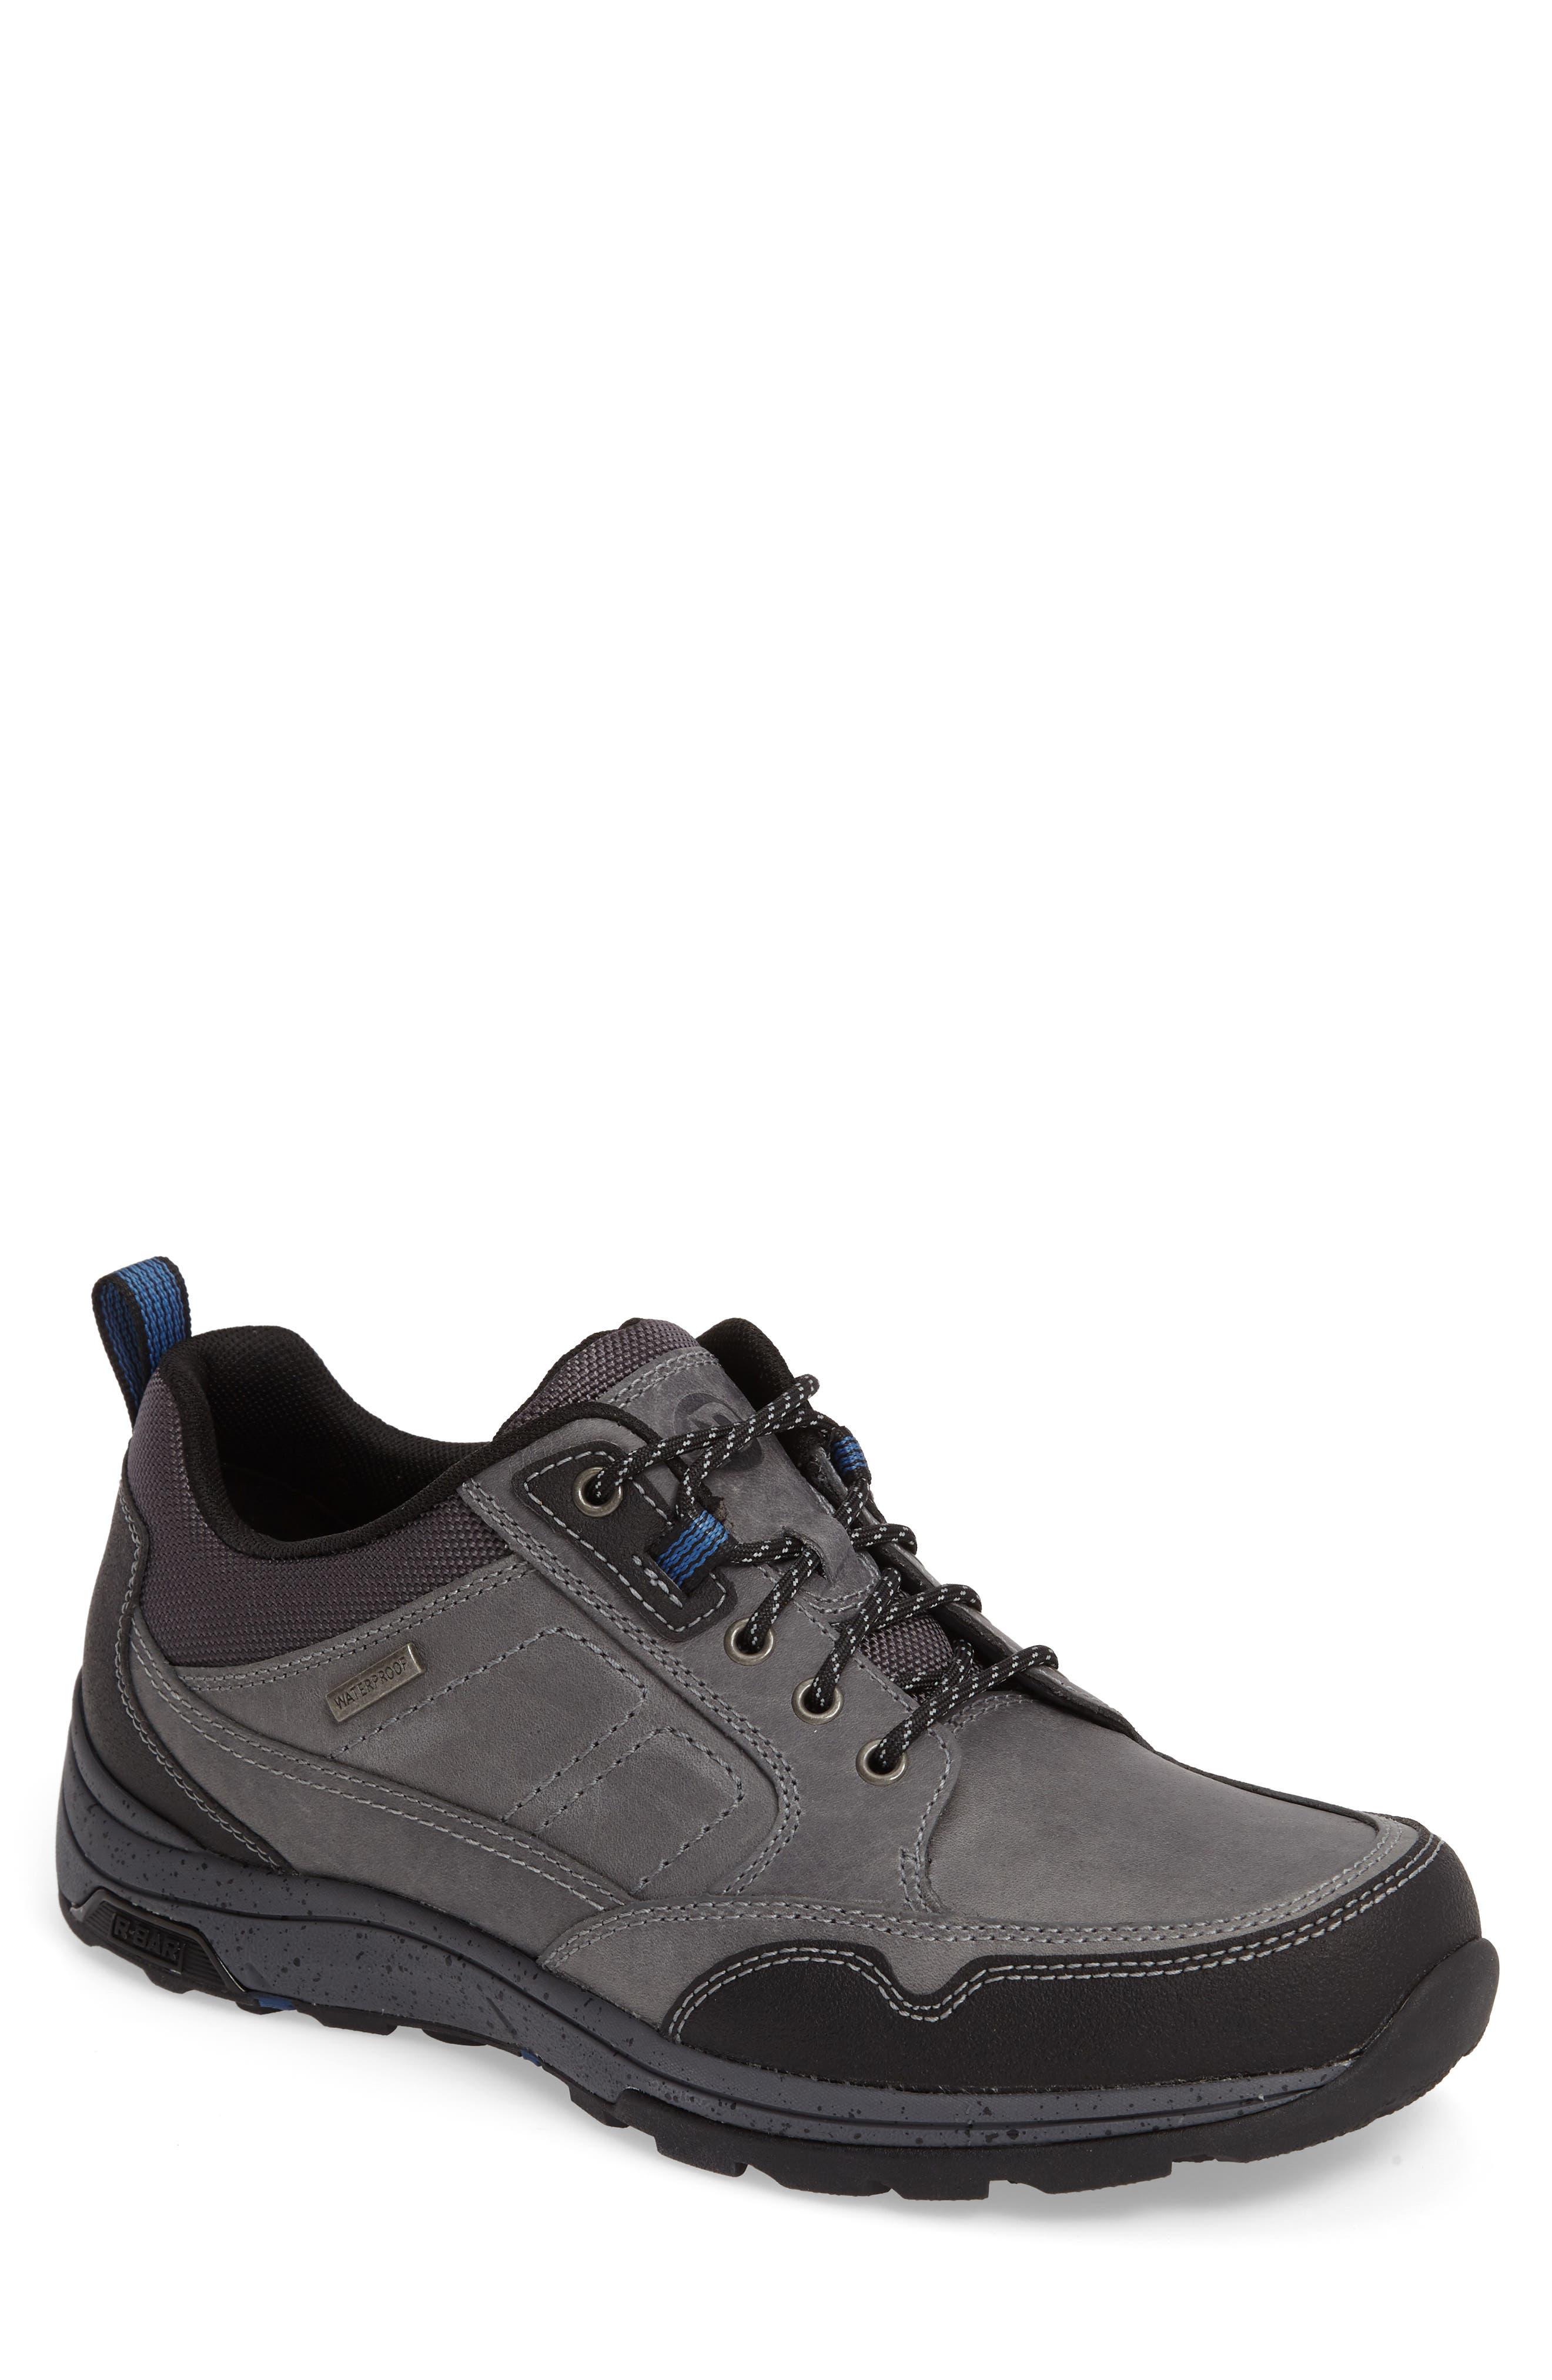 Trukka Hiking Shoe,                         Main,                         color, GREY